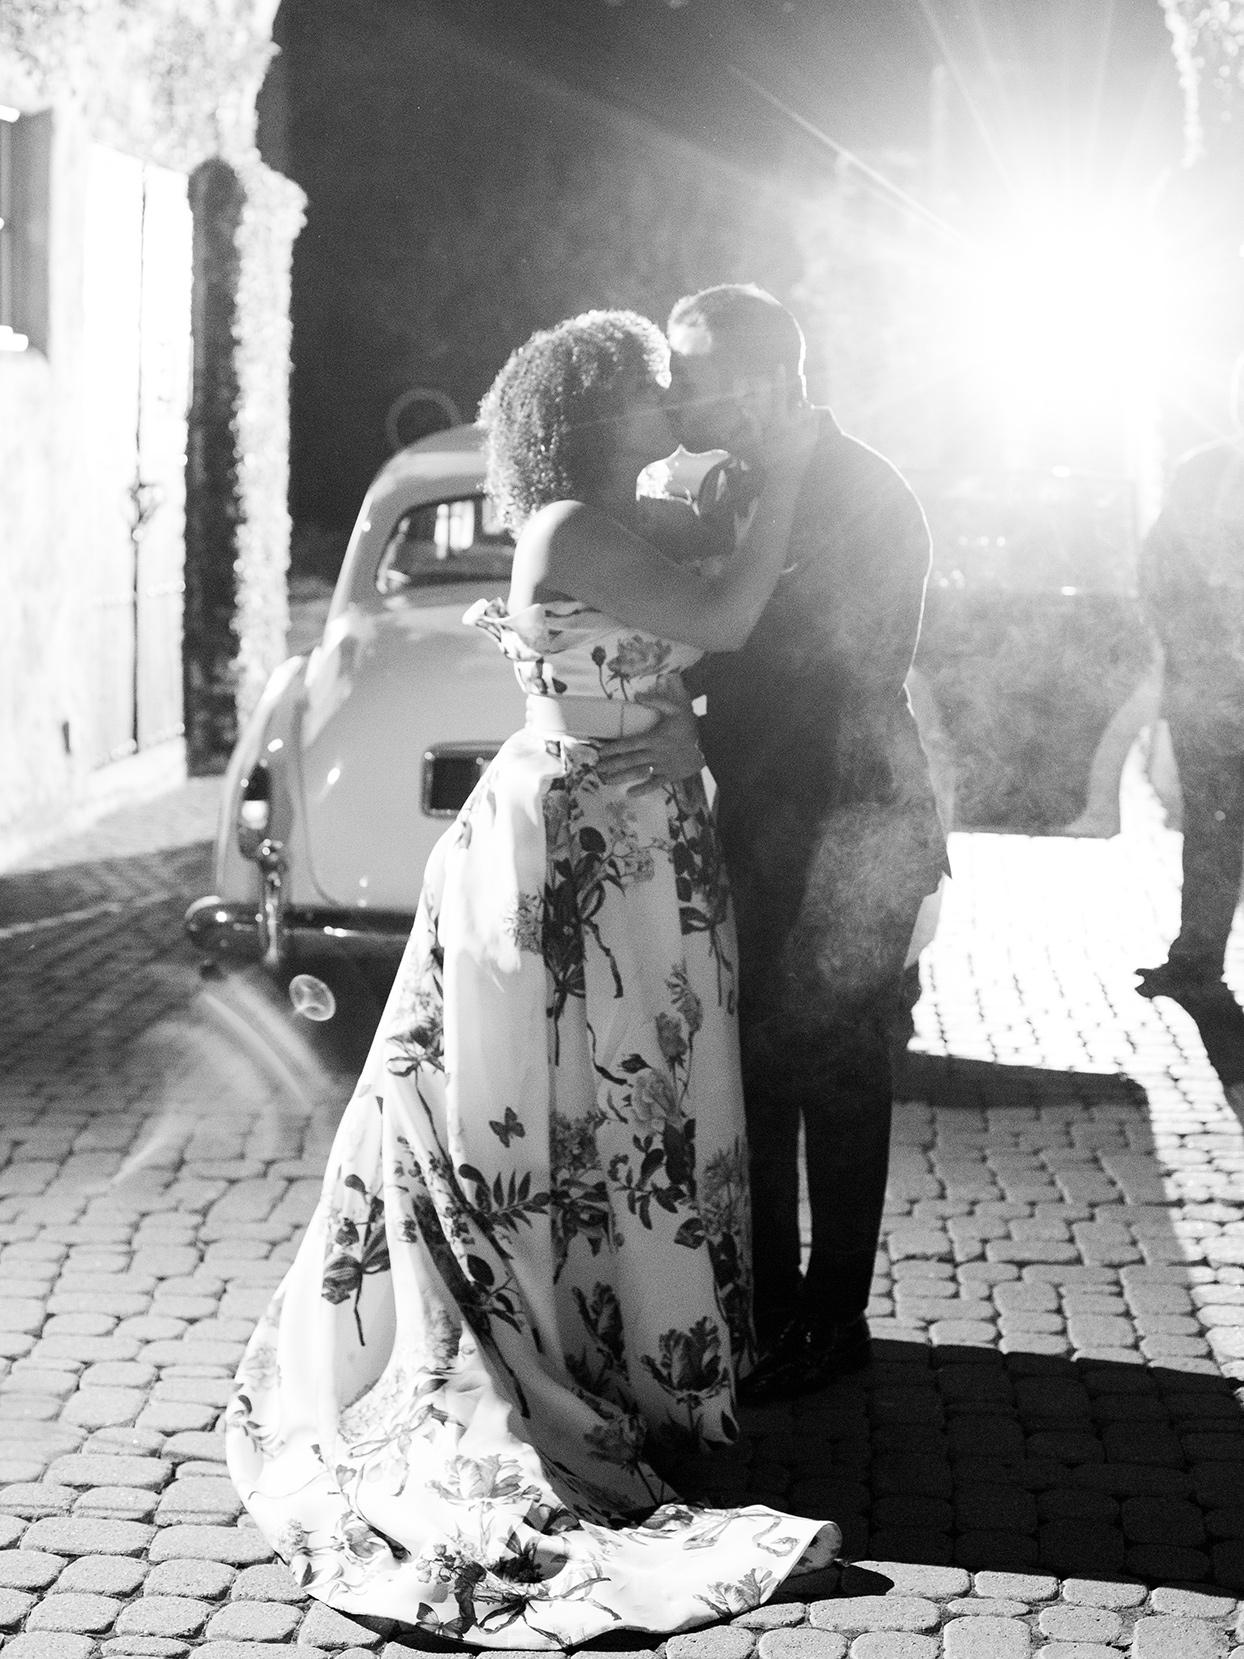 raina salih wedding couple kiss in front of car